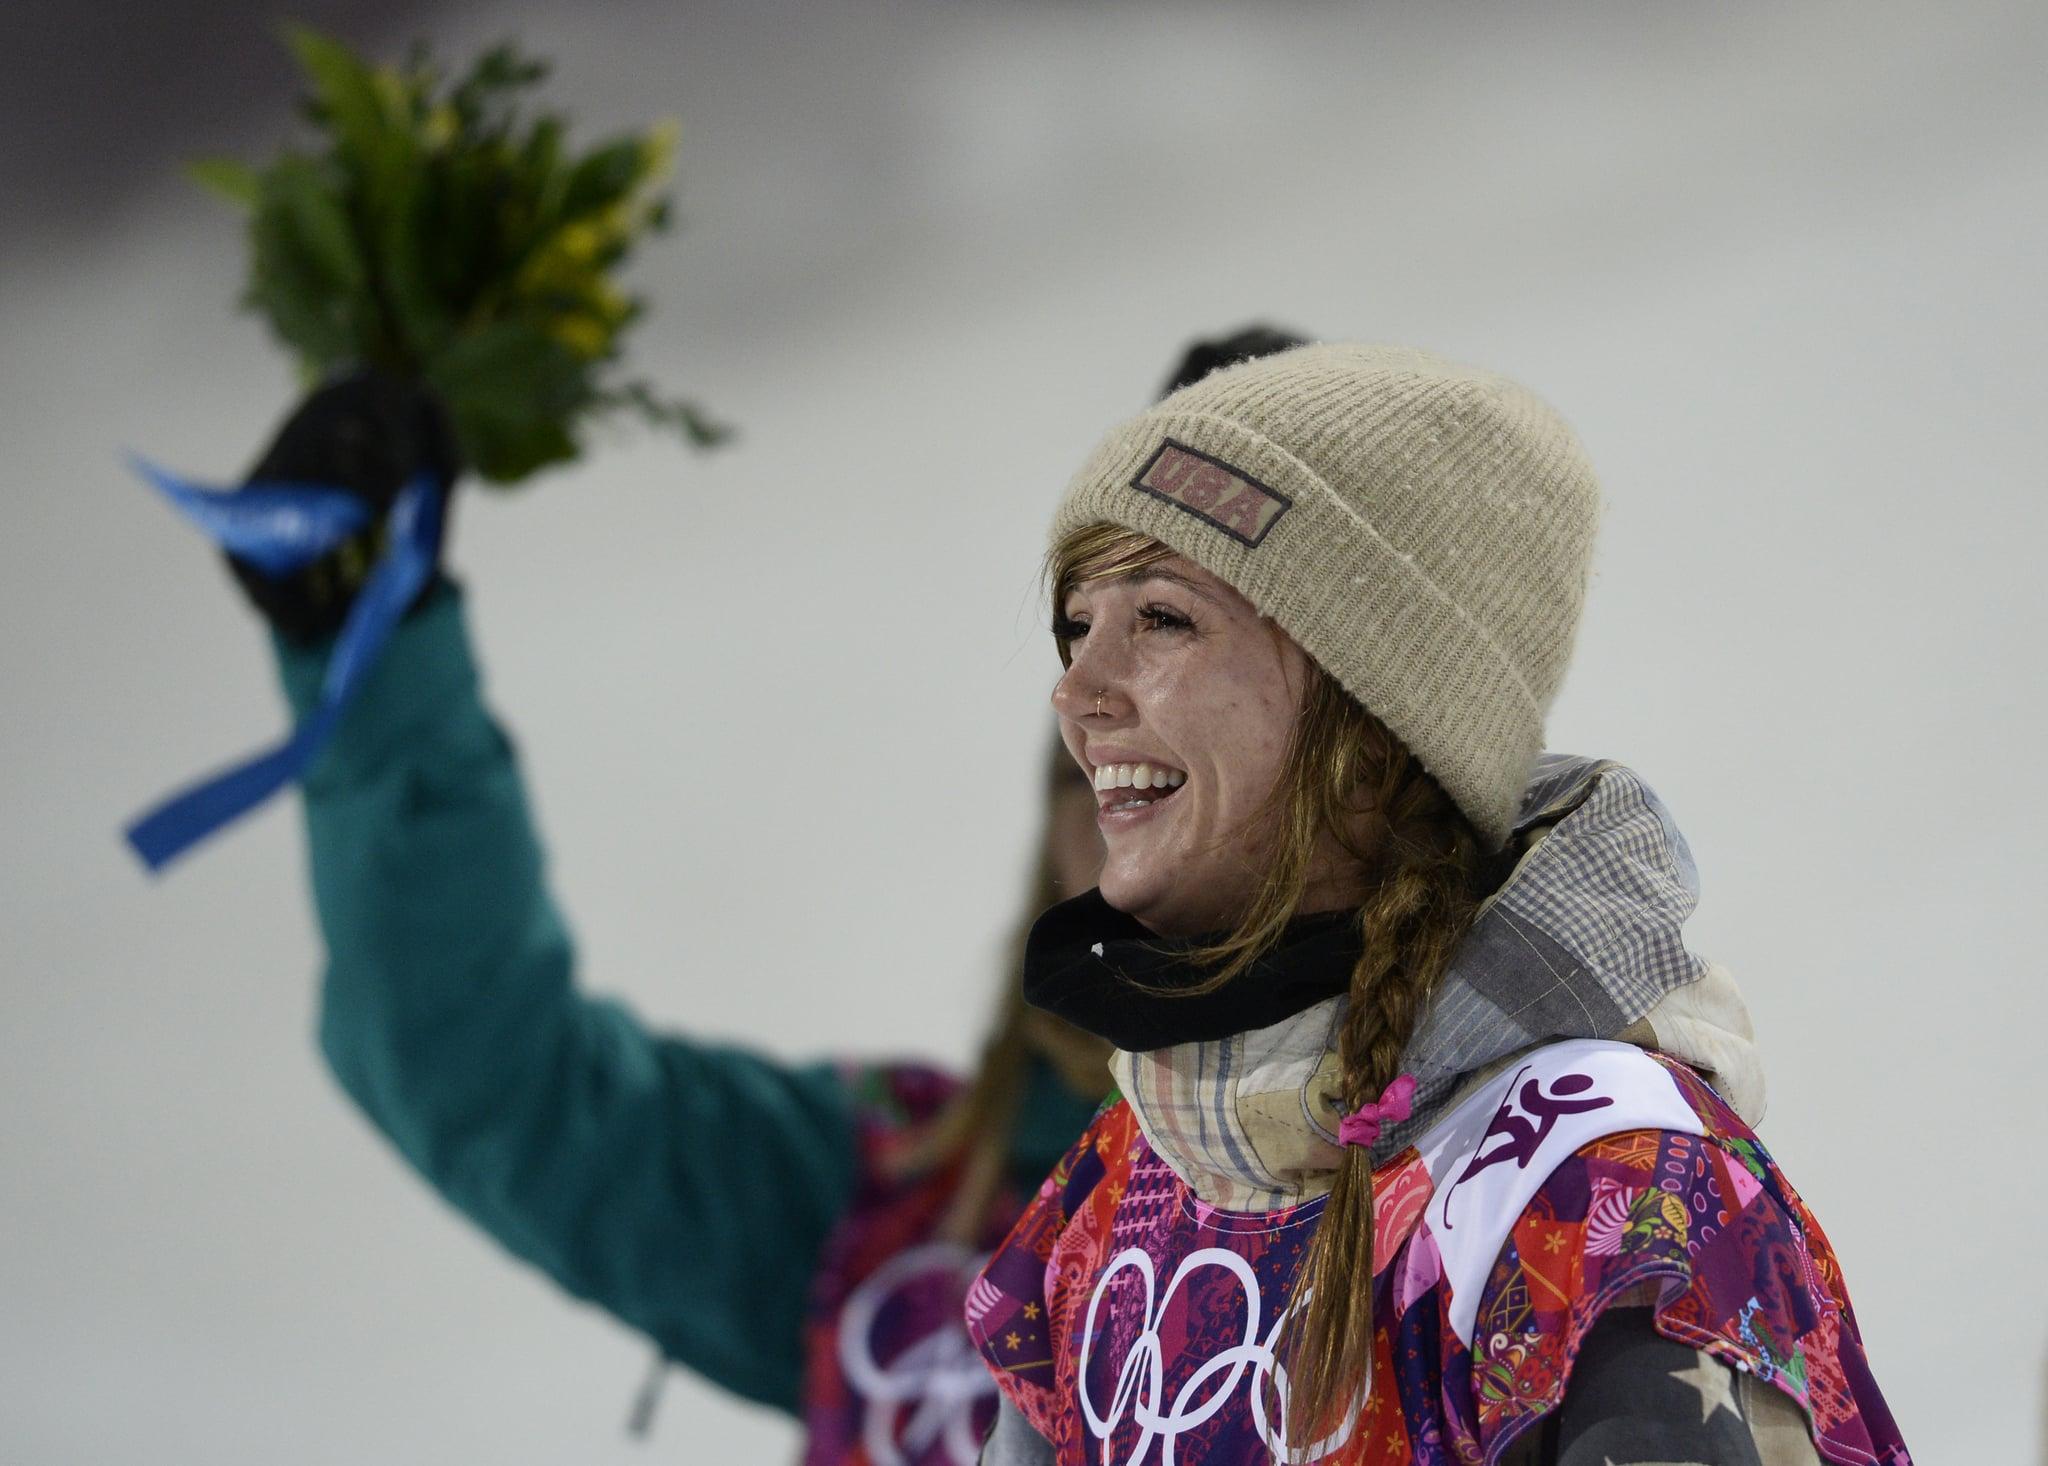 Kaitlyn Farrington Wins in Olympic Debut